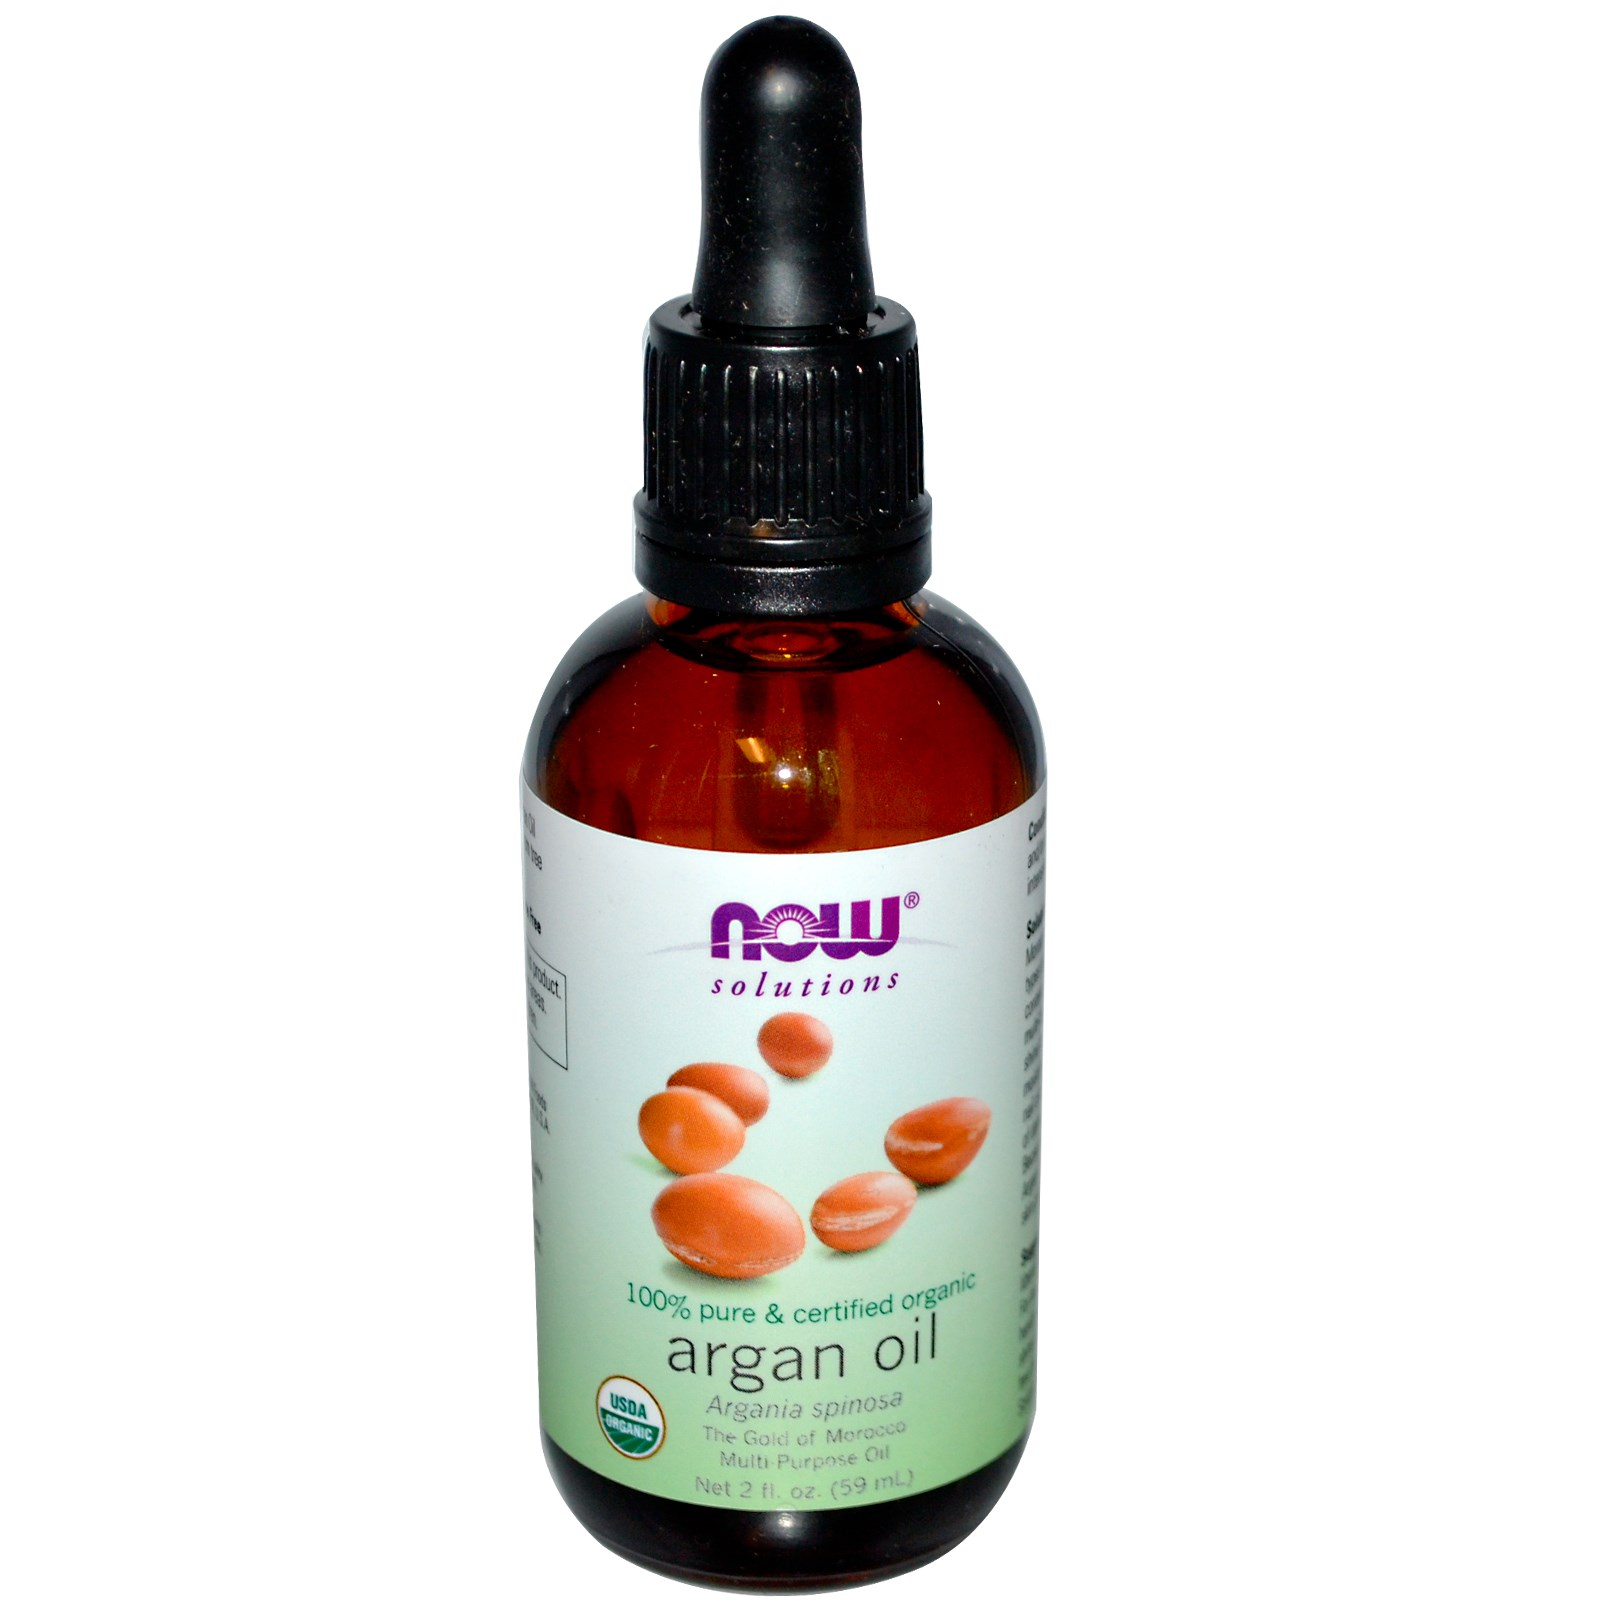 Image of Organic Argan Oil (59 ml) - Now Foods 0733739077349